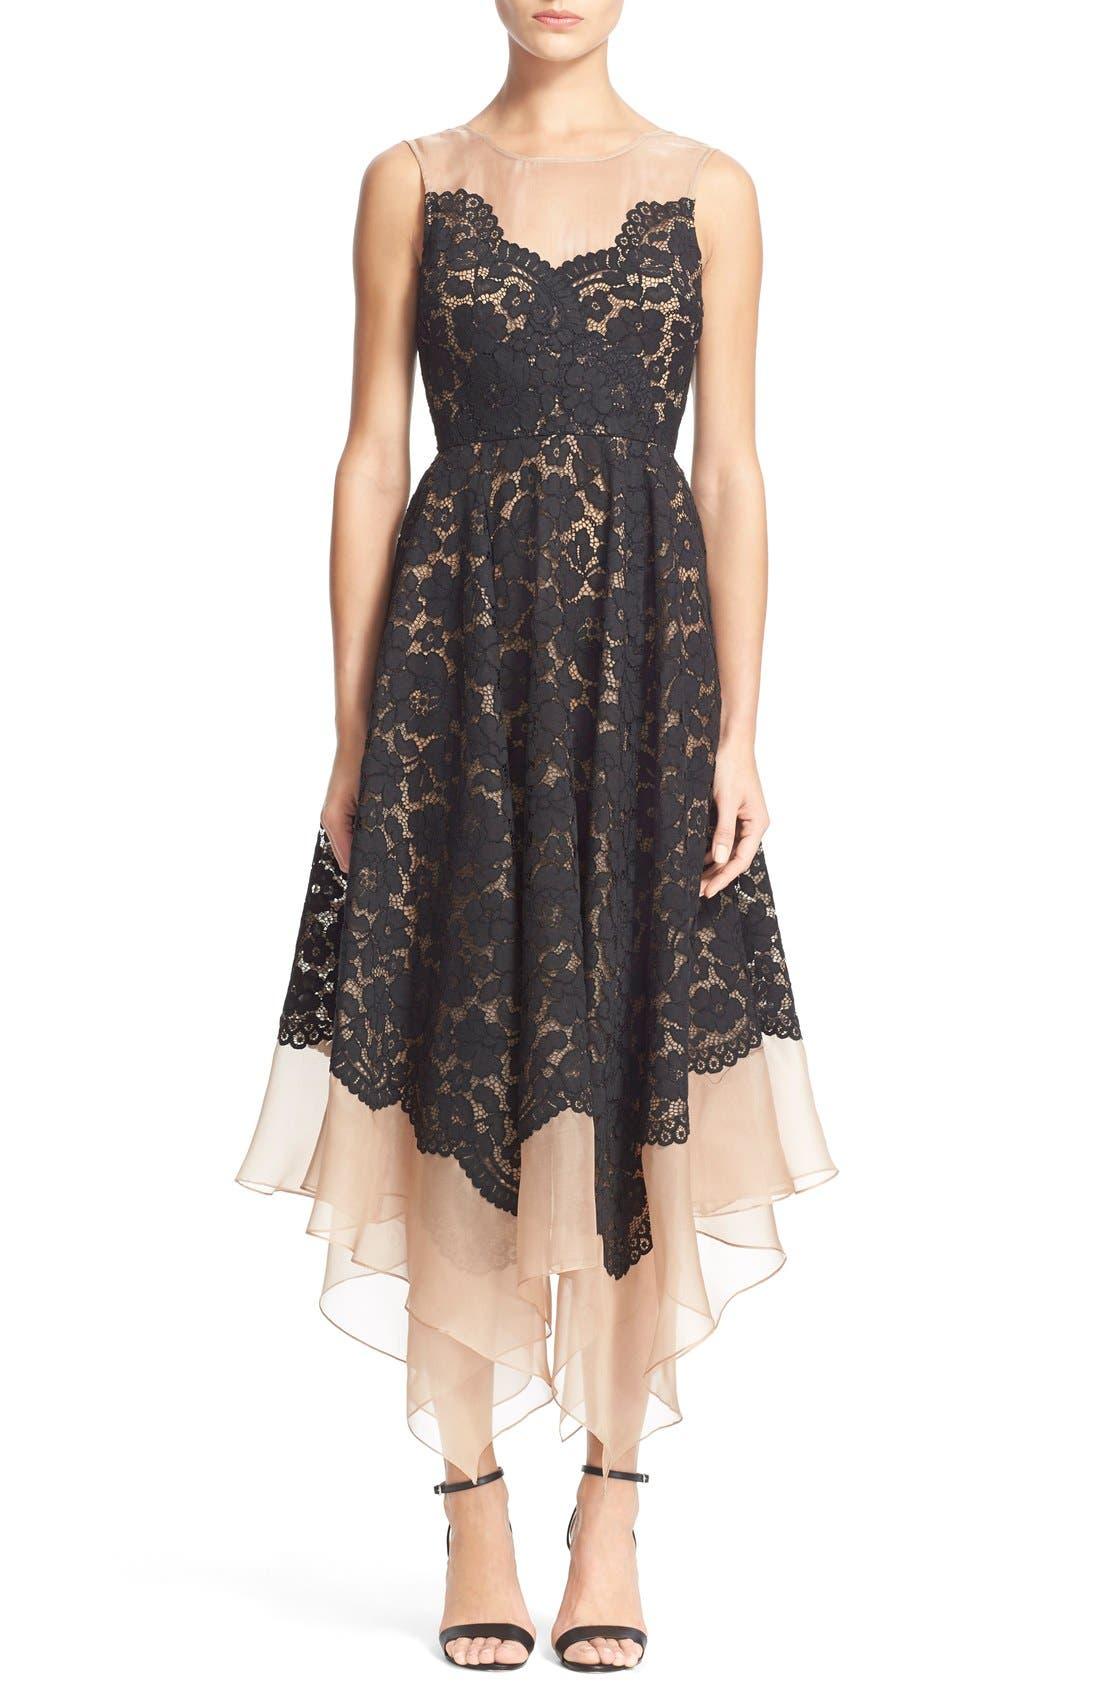 Main Image - Tracy Reese Lace Overlay Handkerchief Illusion Dress